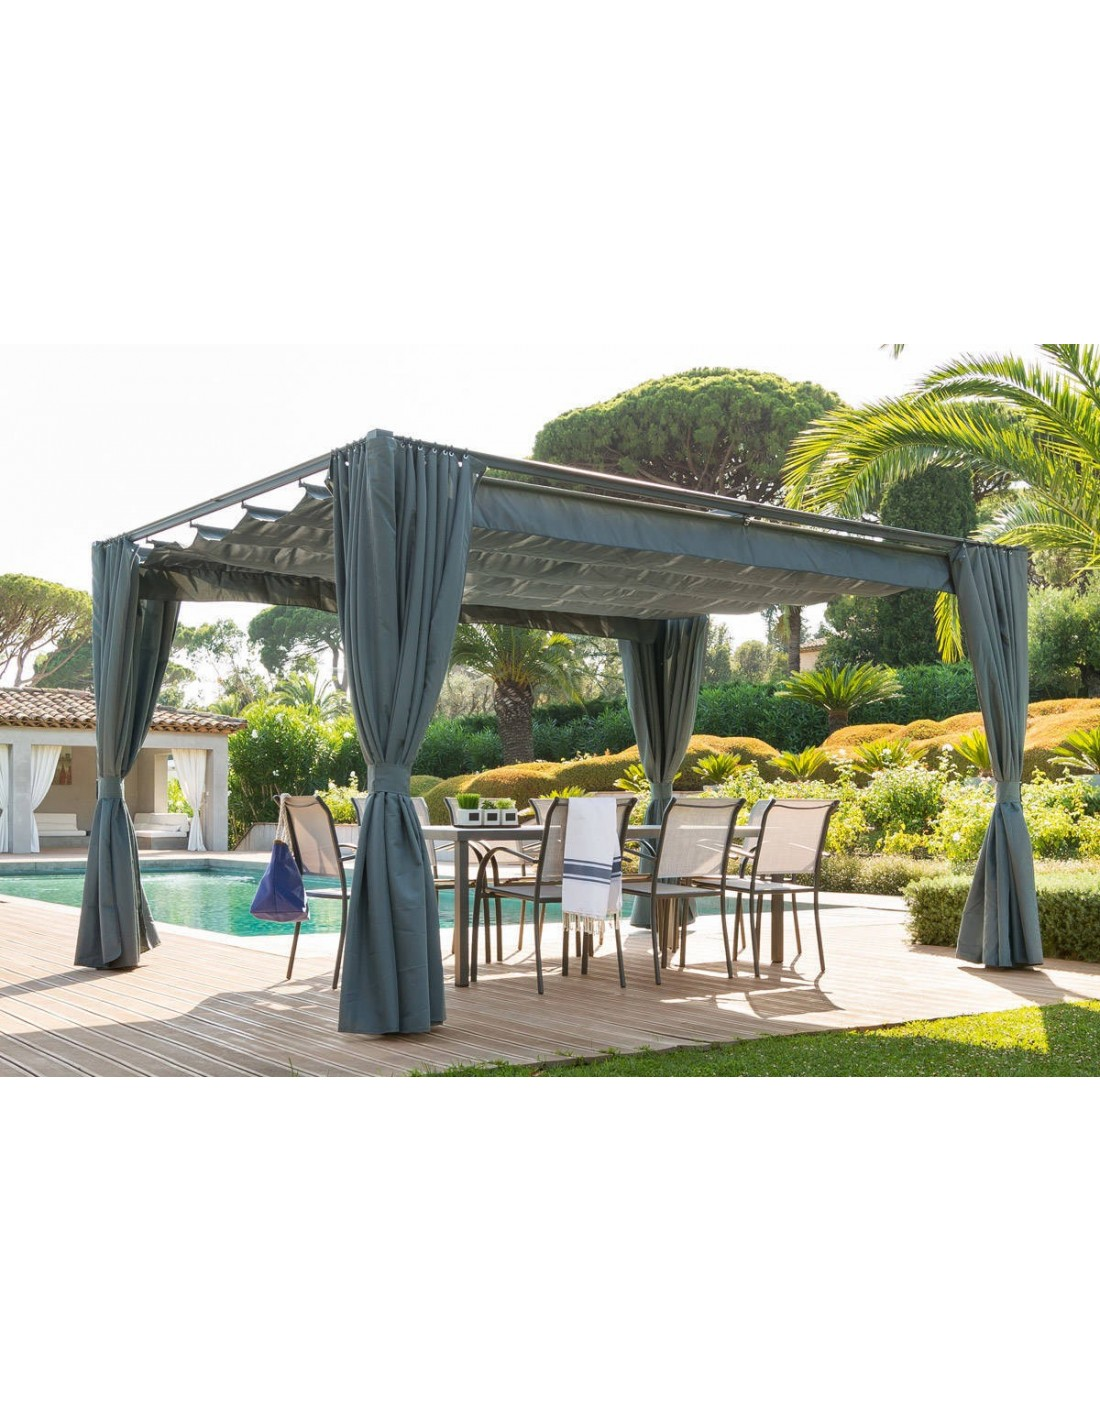 Tonnelle de jardin palmeira ardoise en aluminium 3 x 4 m - Tonnelle de jardin aluminium ...